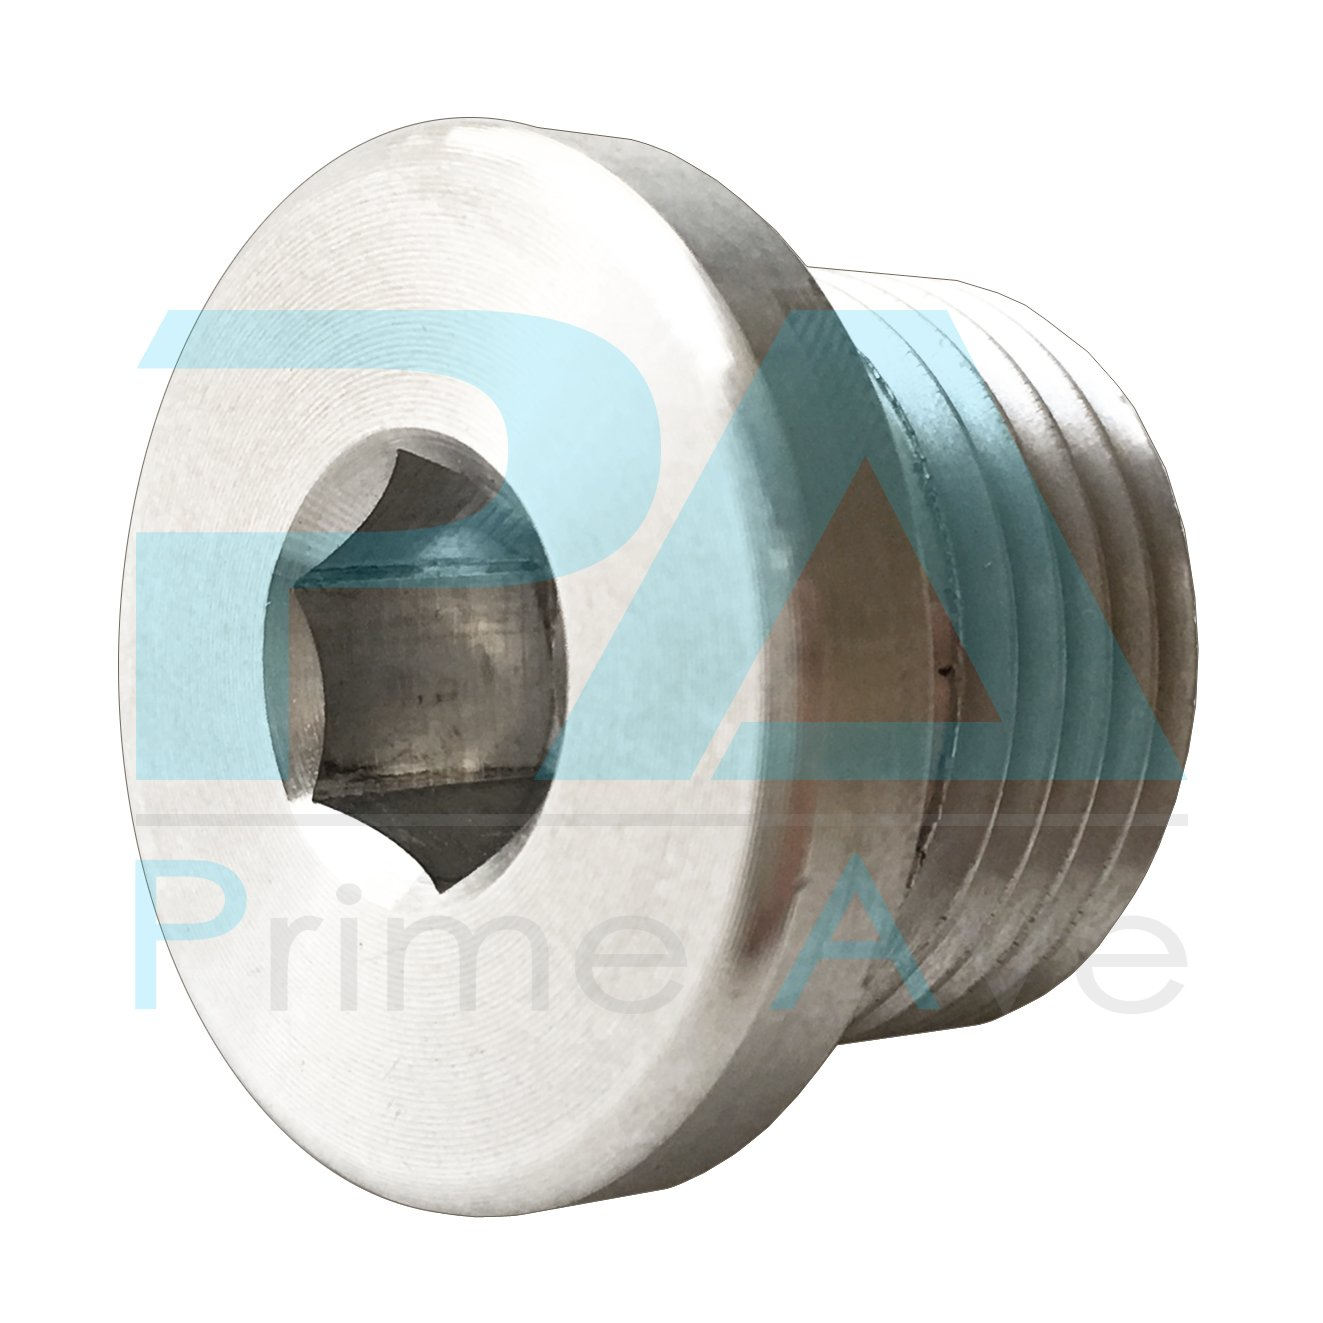 PA (1) OEM Aluminum Oil Drain Plug + (5) Crush Aluminum Gasket Washers For Porsche Prime Ave